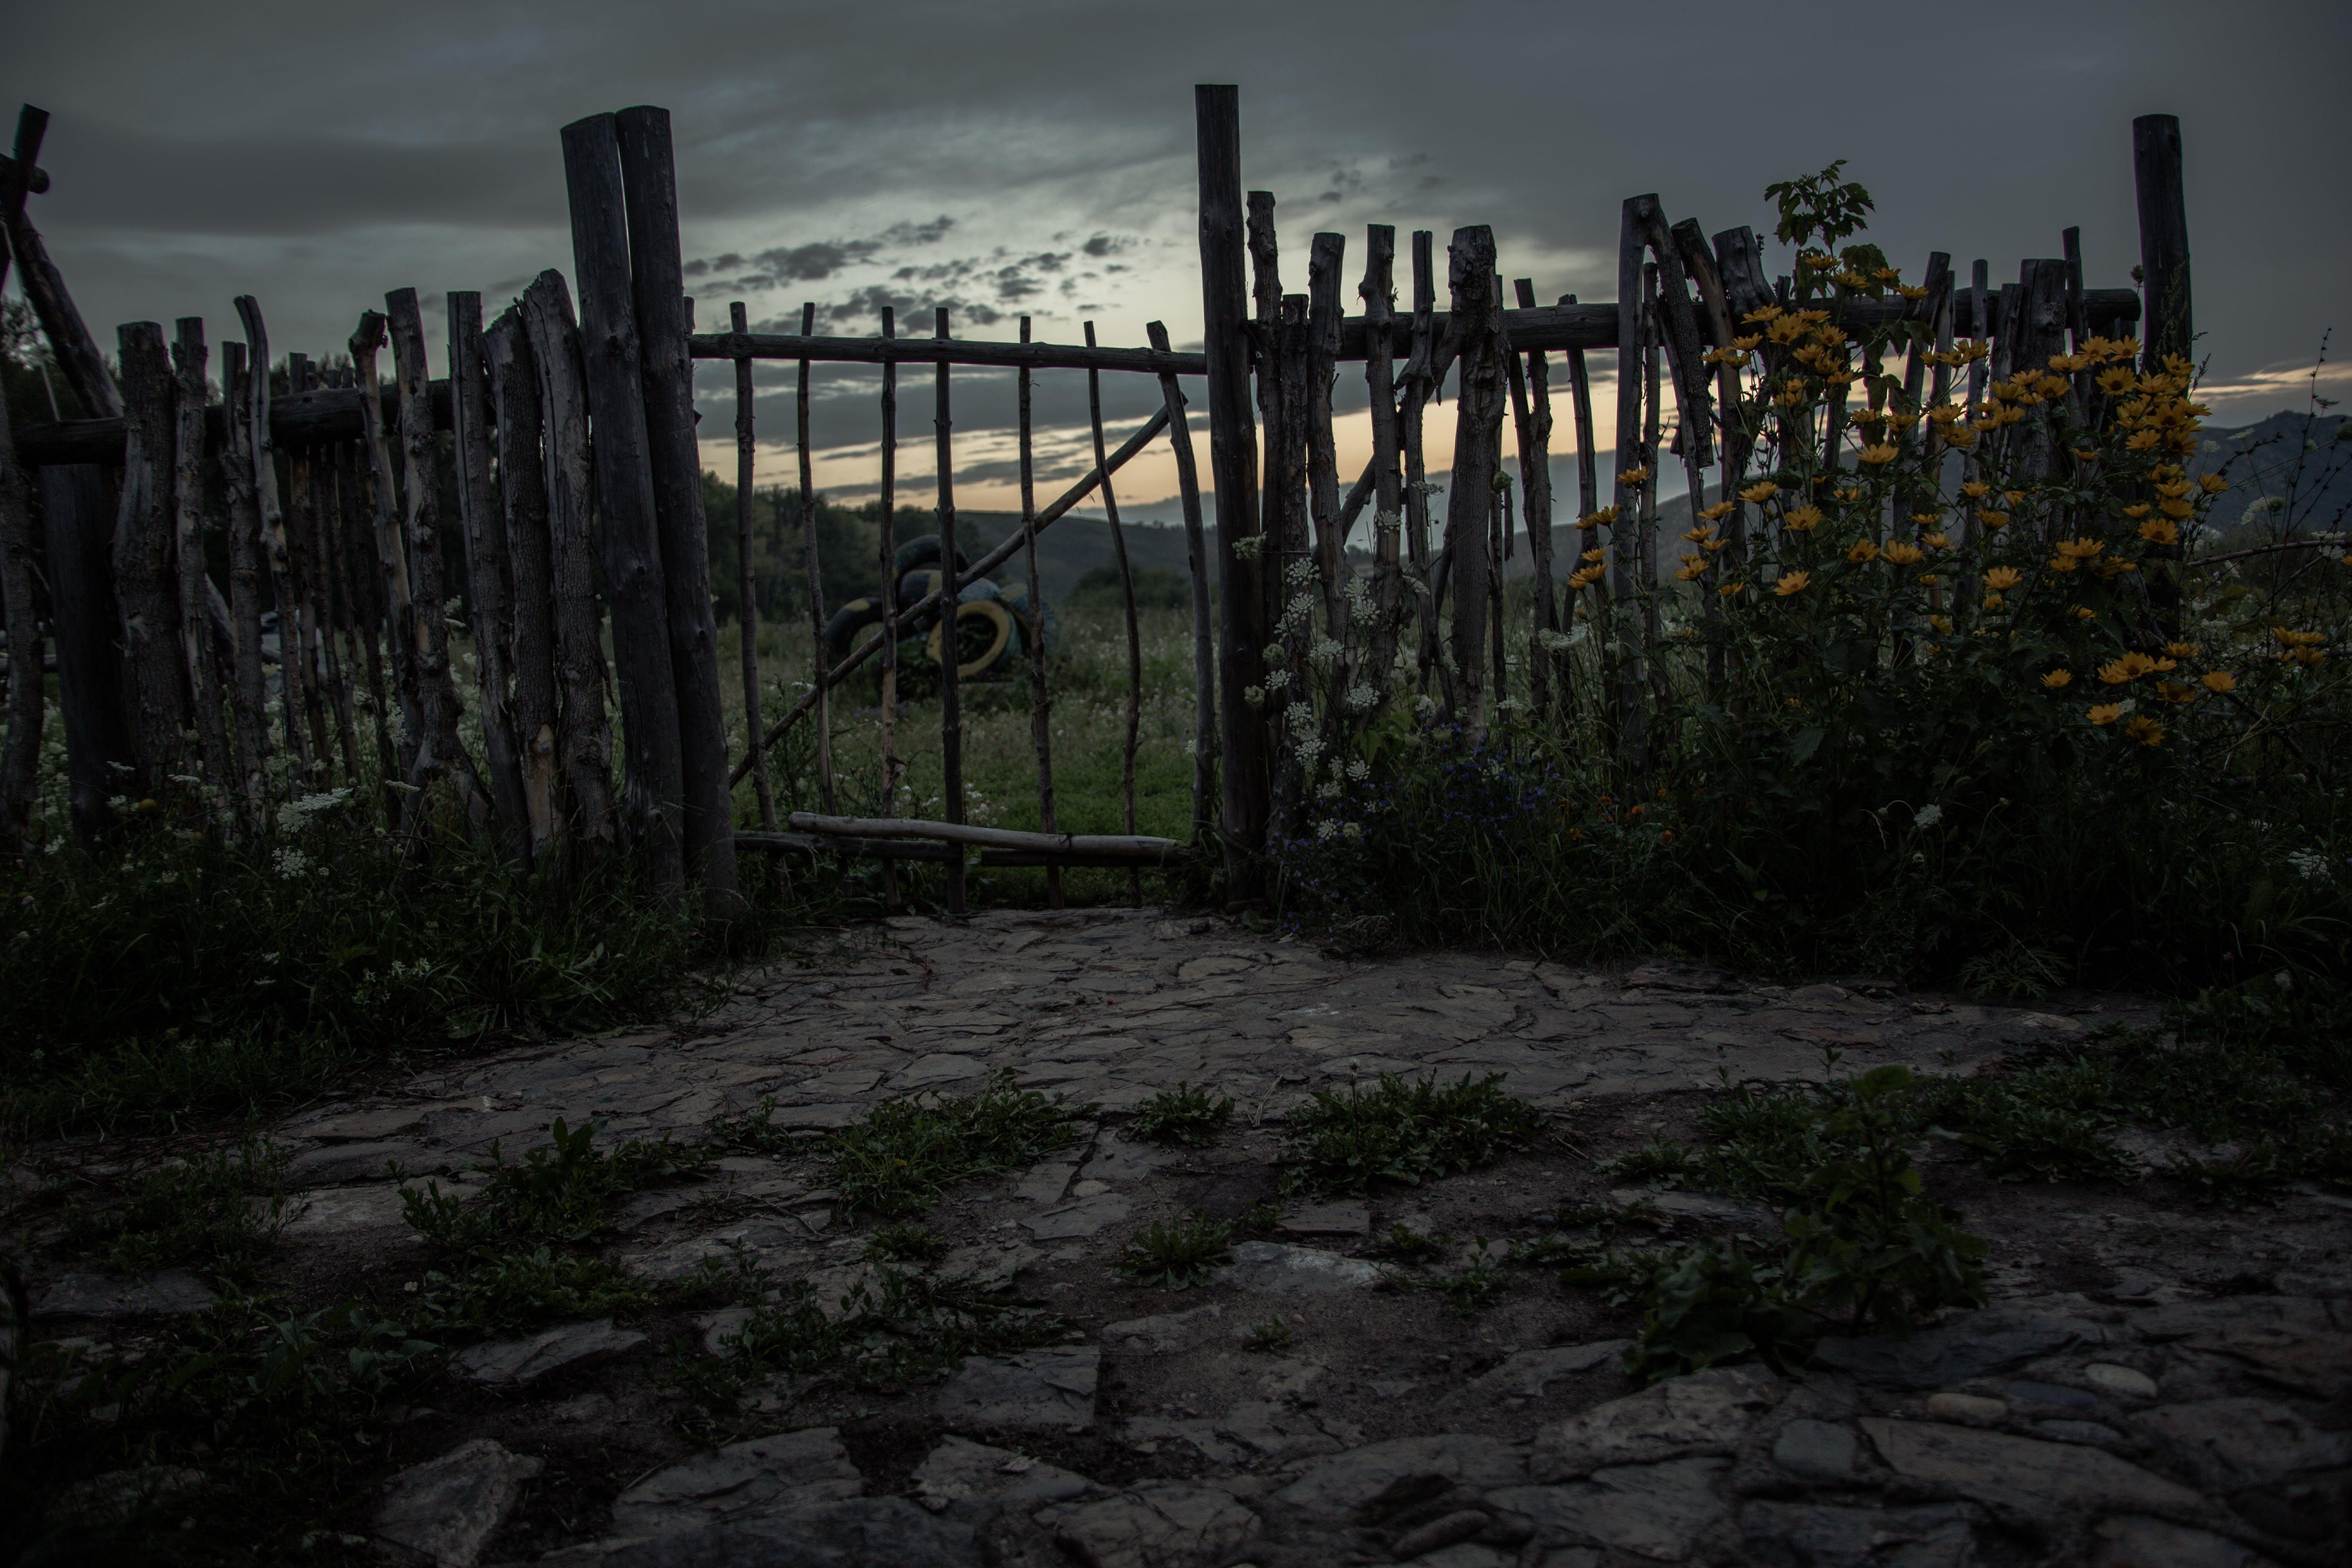 Black Wooden Gate